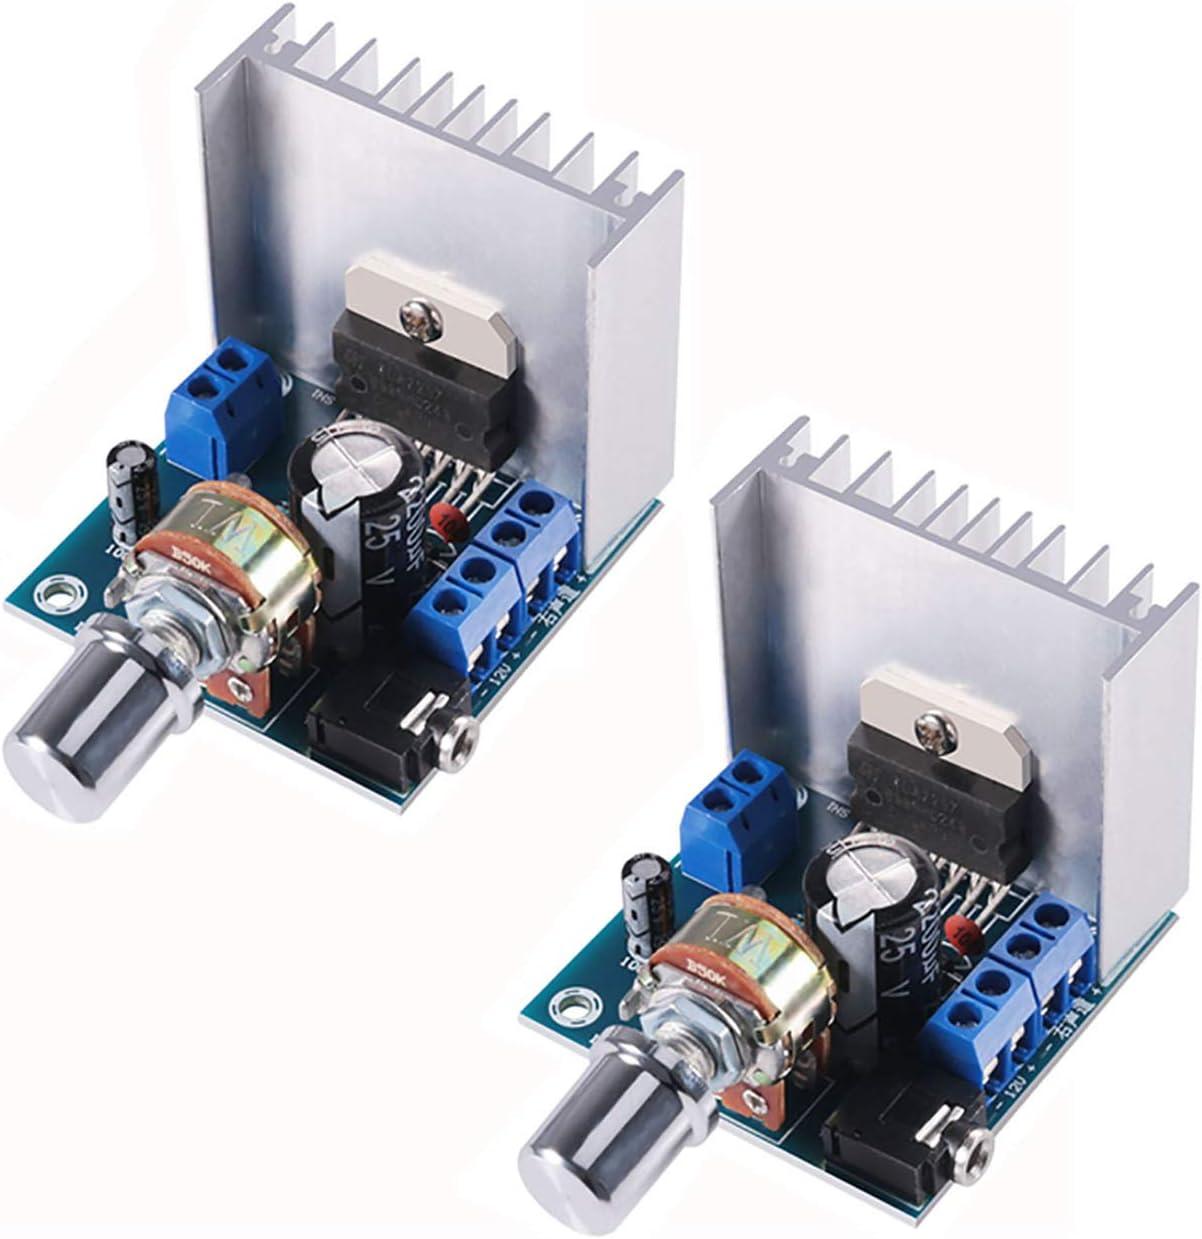 TDA7297 Amplifier Board 15W+15W Dual Track Stereo Modul DC 12V DIY C5E3